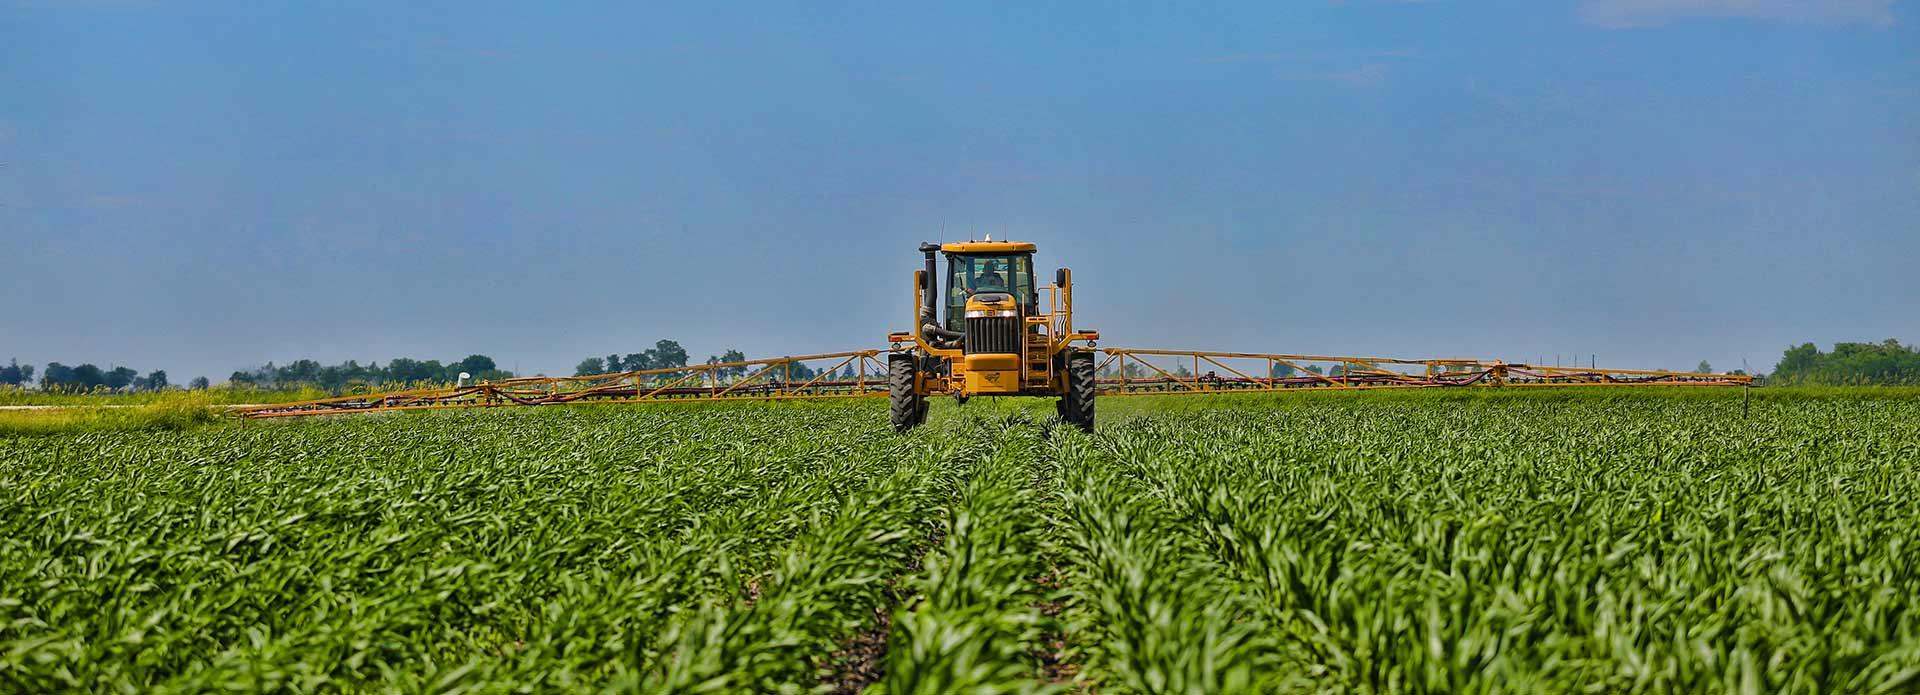 Eldon-C-Stutsman-Inc-Agronomy-Spraying-Corn